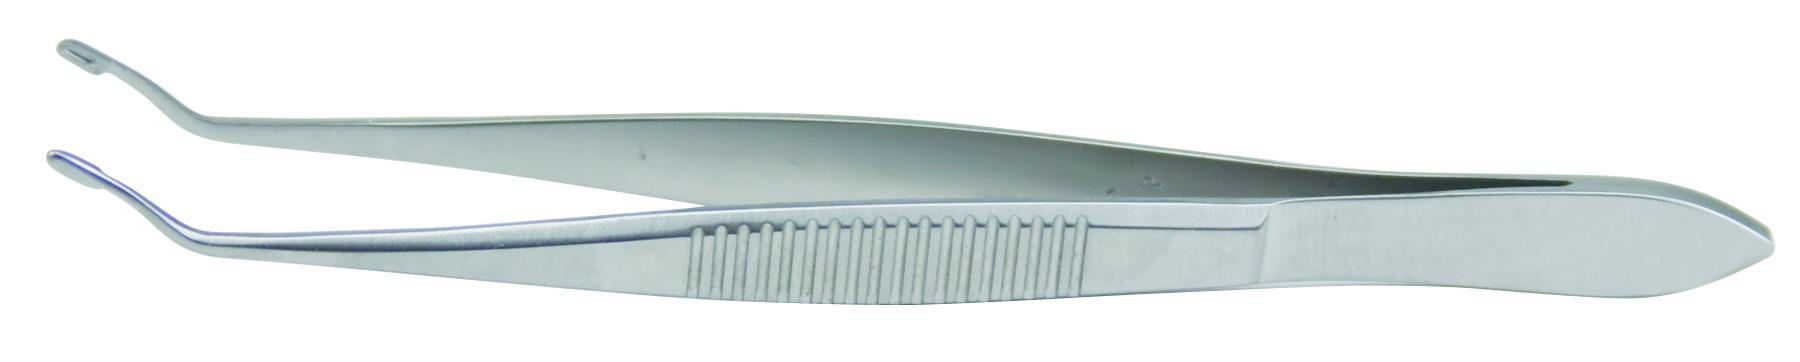 arruga-capsule-forceps-4-102-cm-new-curve-18-1002-miltex.jpg